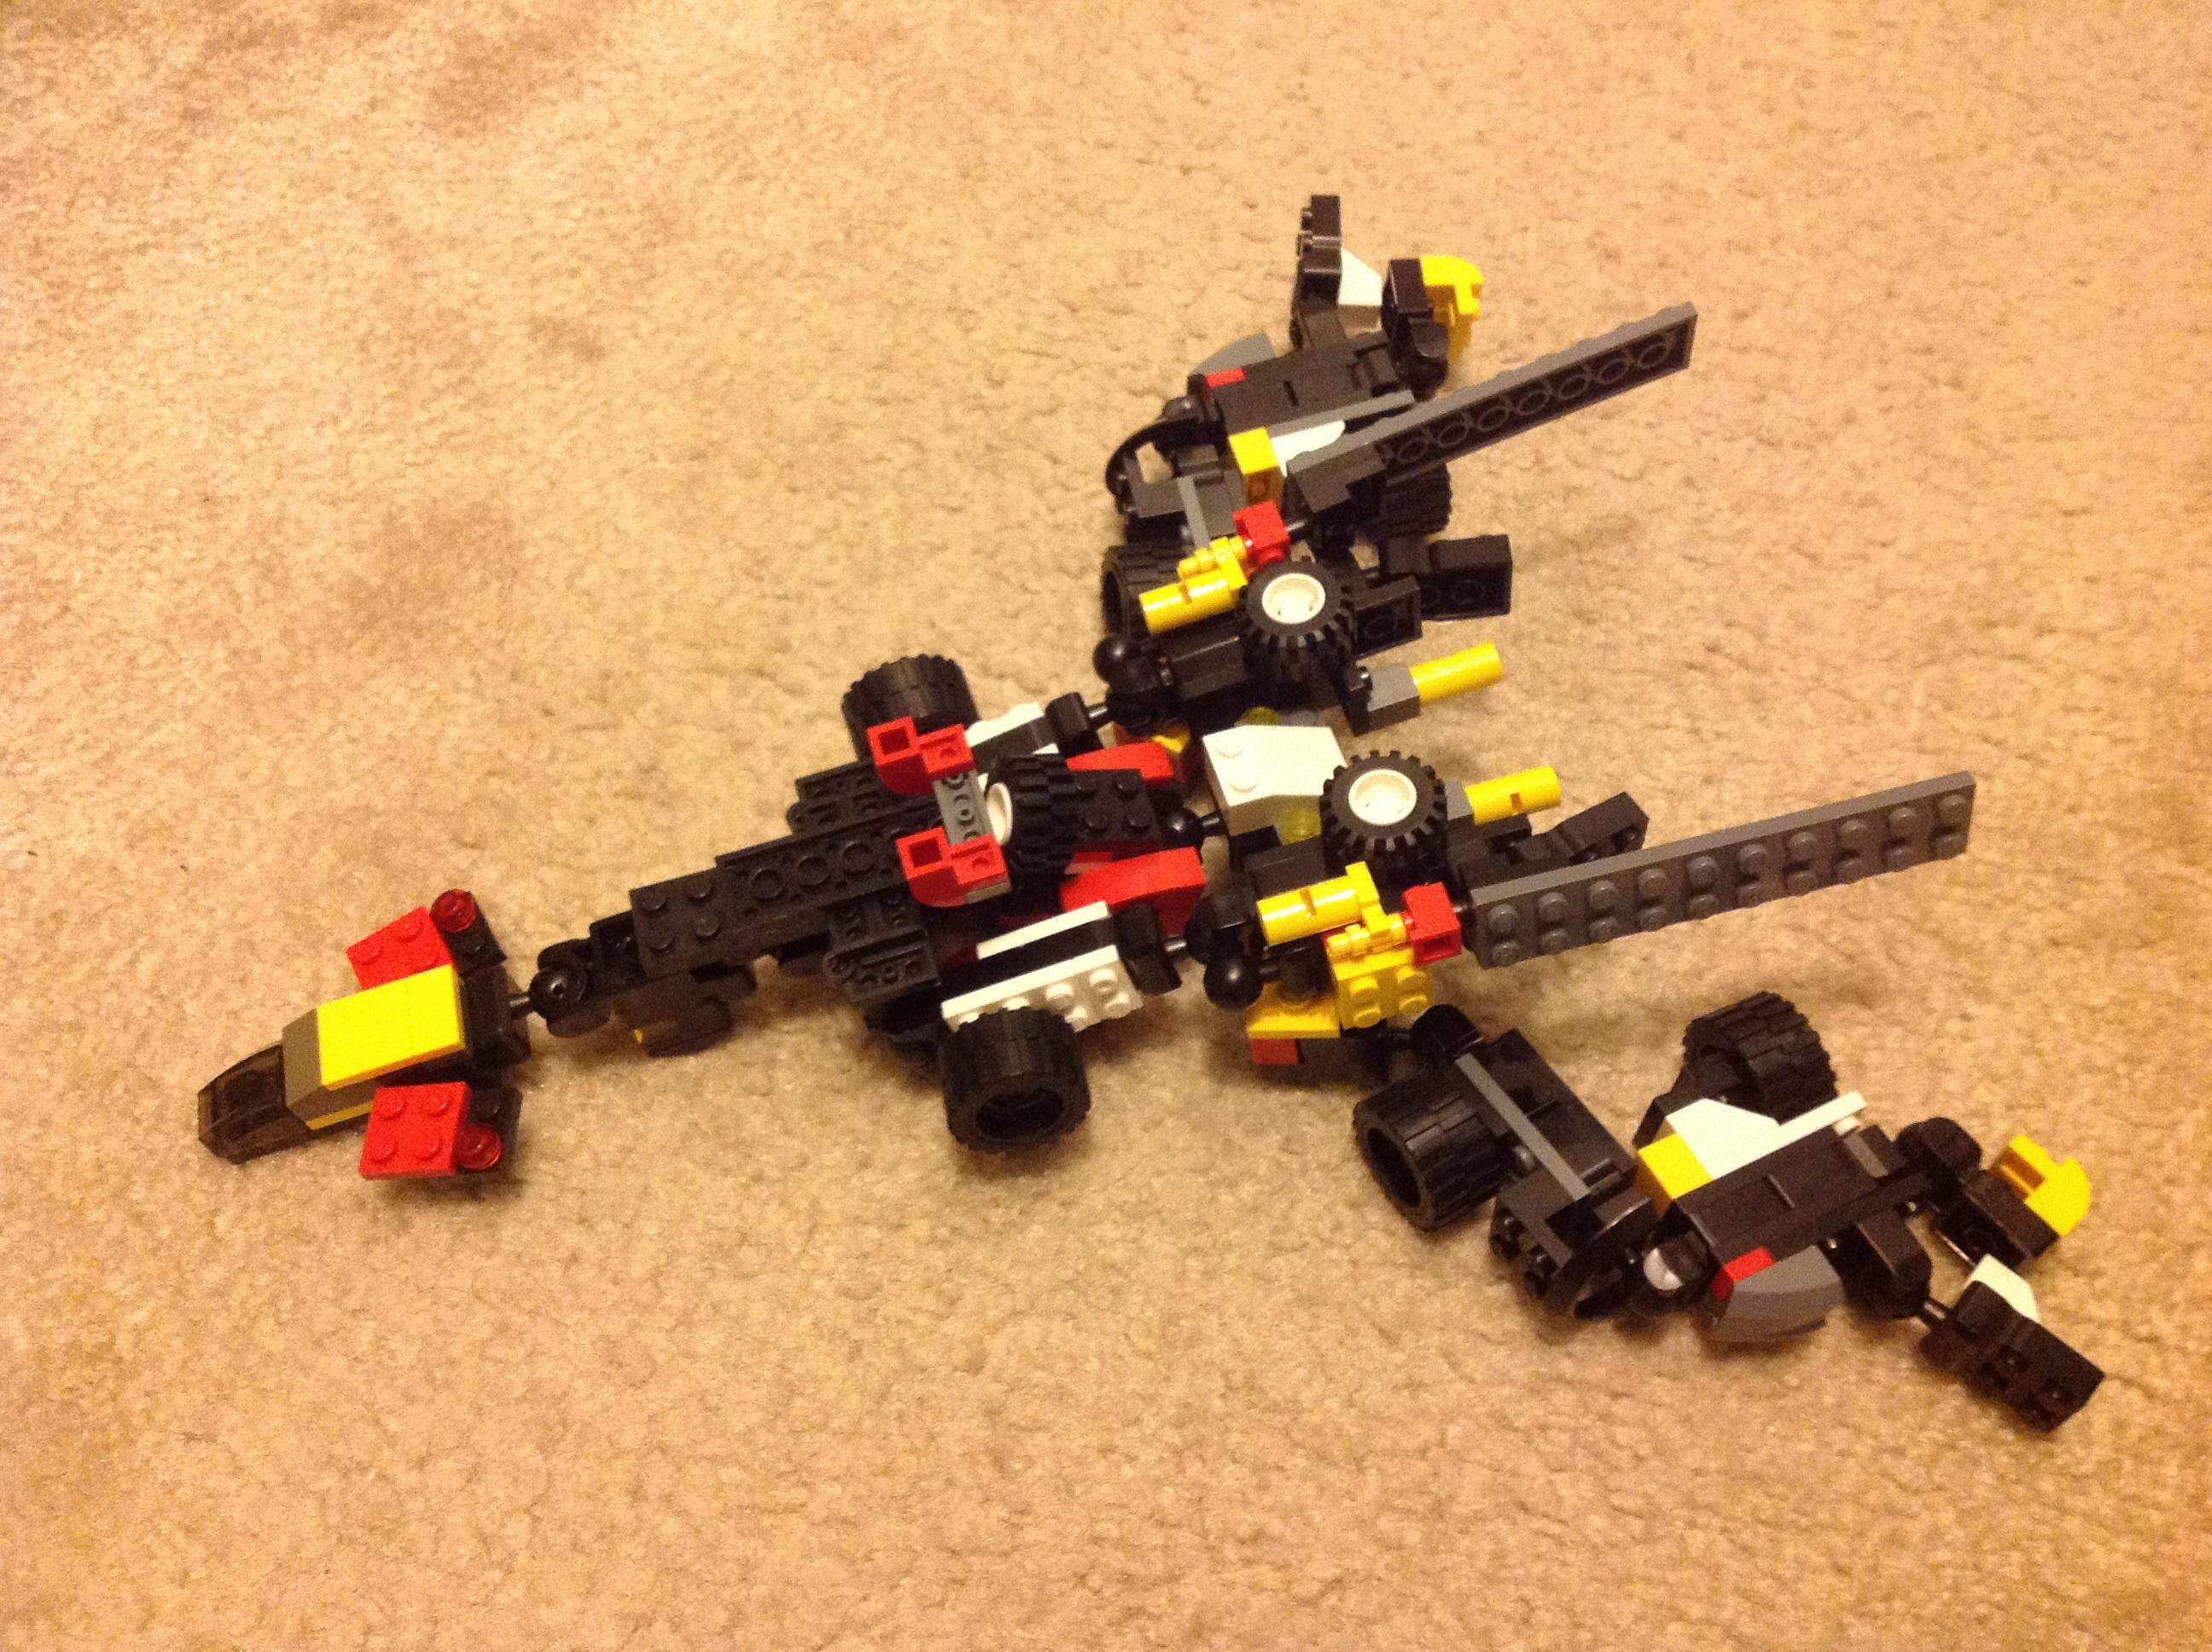 Jetosaur the Lego Transformer